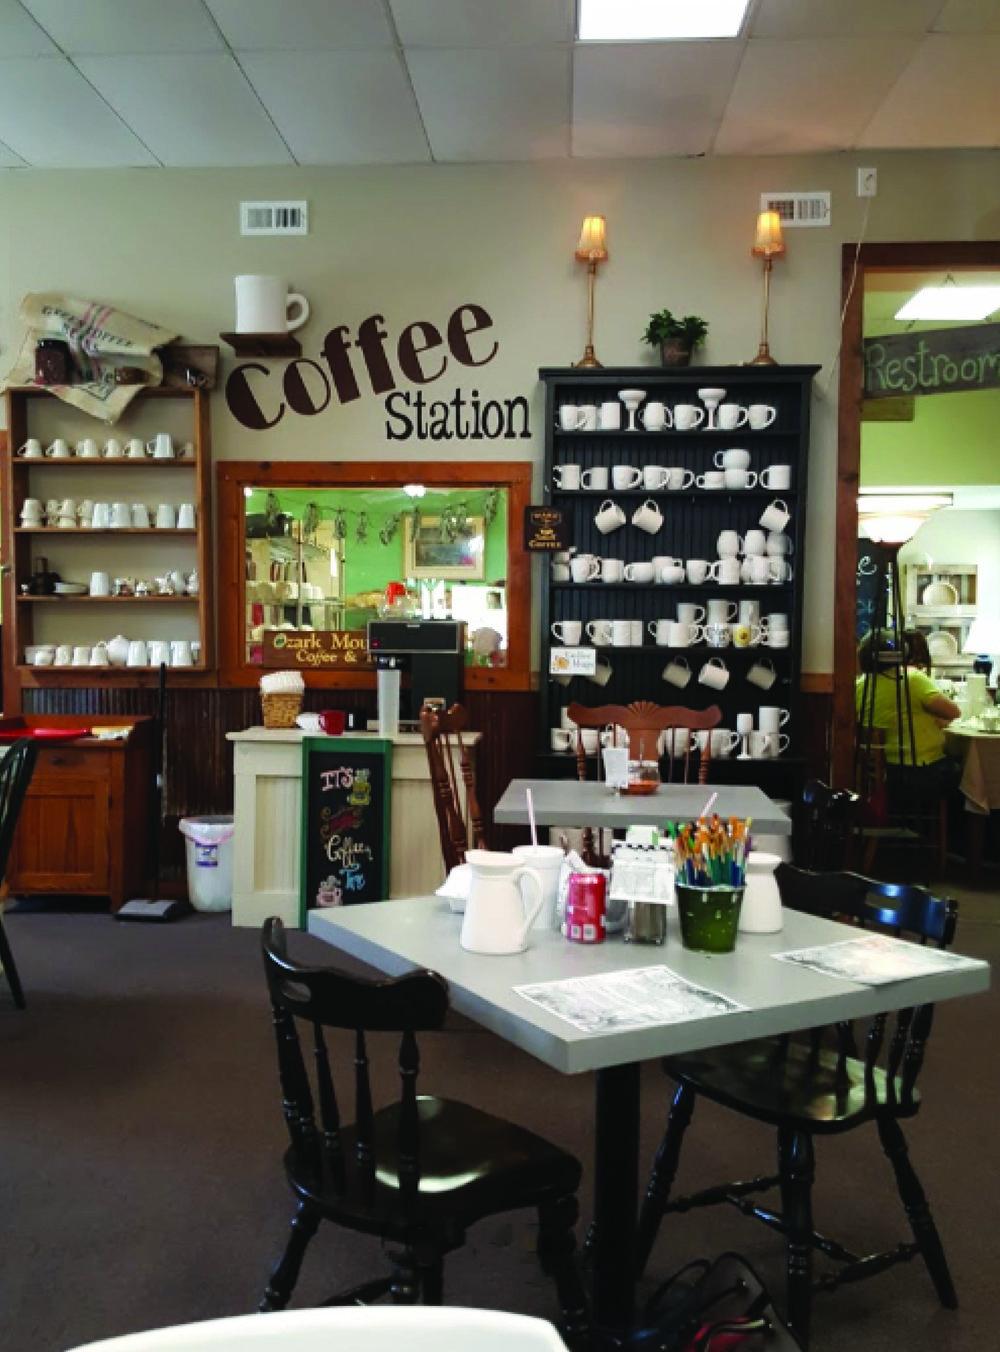 Village Pottery Cafe Republic, Mo